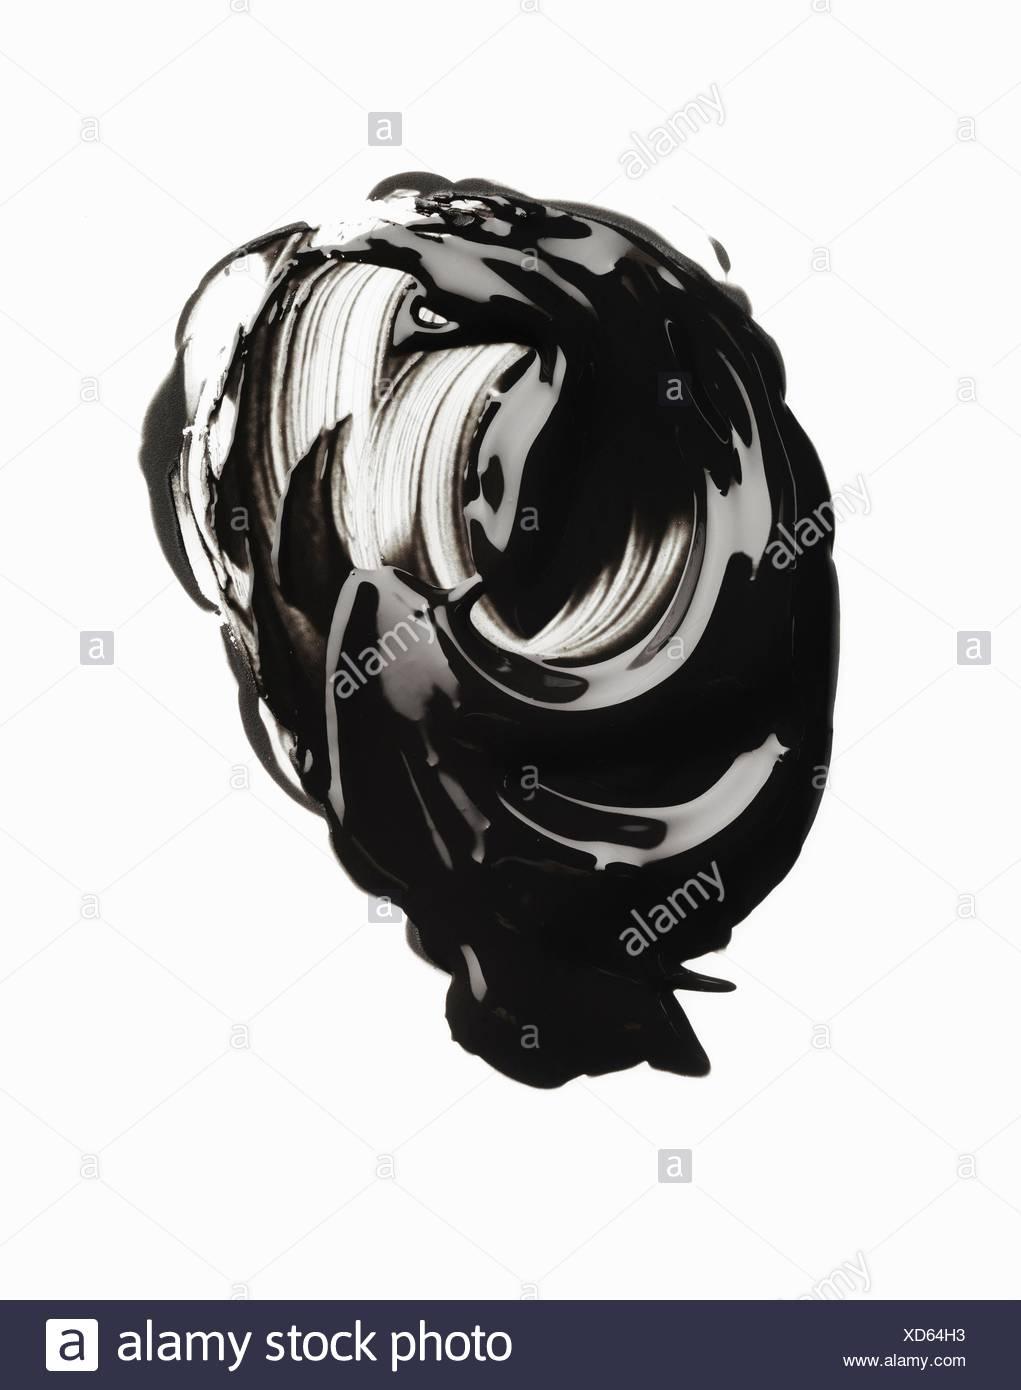 Swirly smudge of glossy mascara - Stock Image